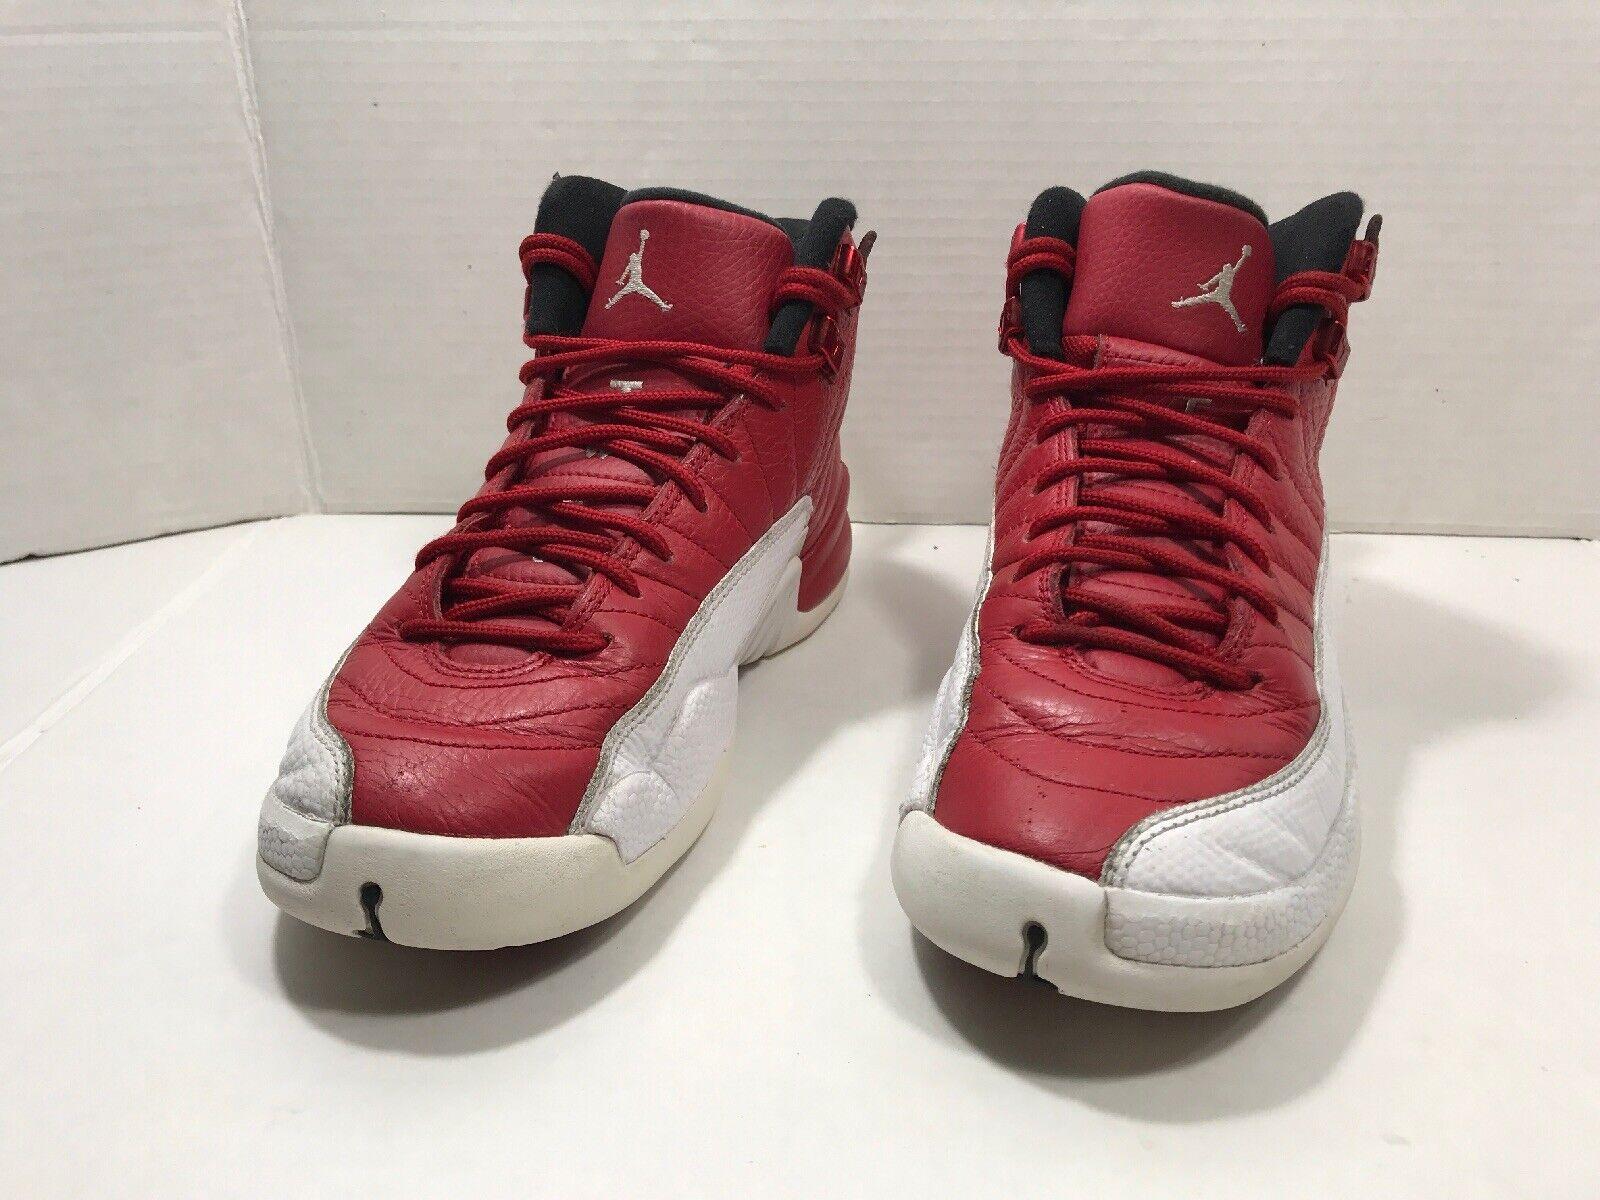 "GS 153265 600 Jordan Retro 12 /""Gym Red/"" Gym Red//White-Black"